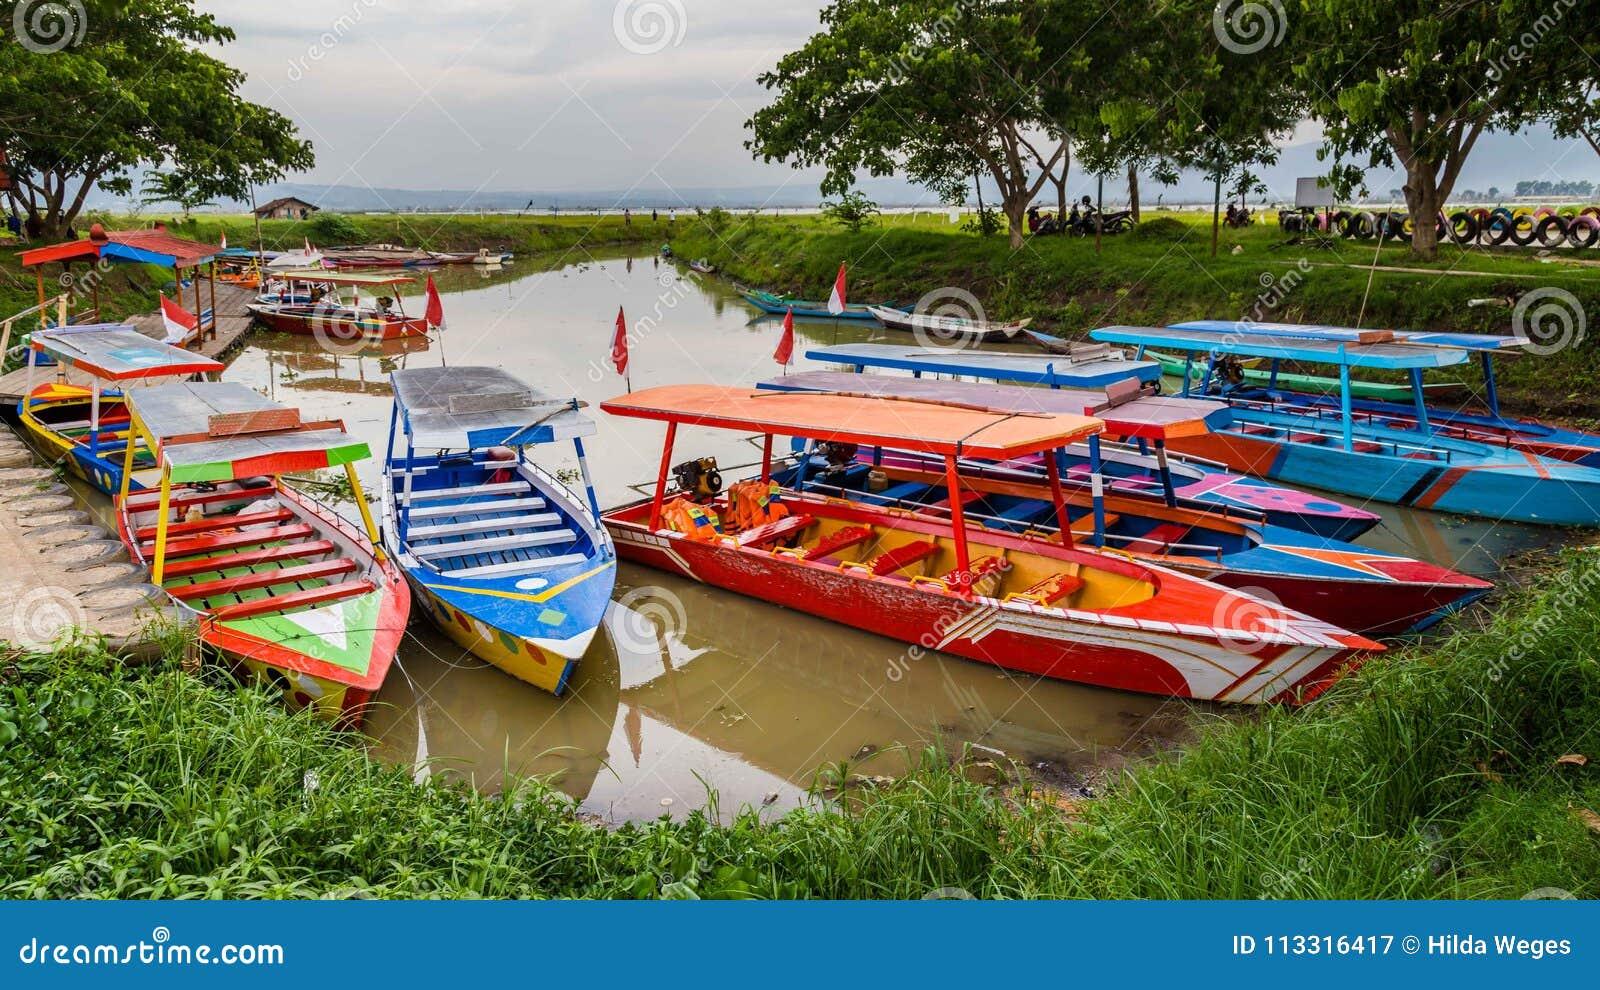 Rawapening, Semarang, Środkowy Jawa, Indonezja